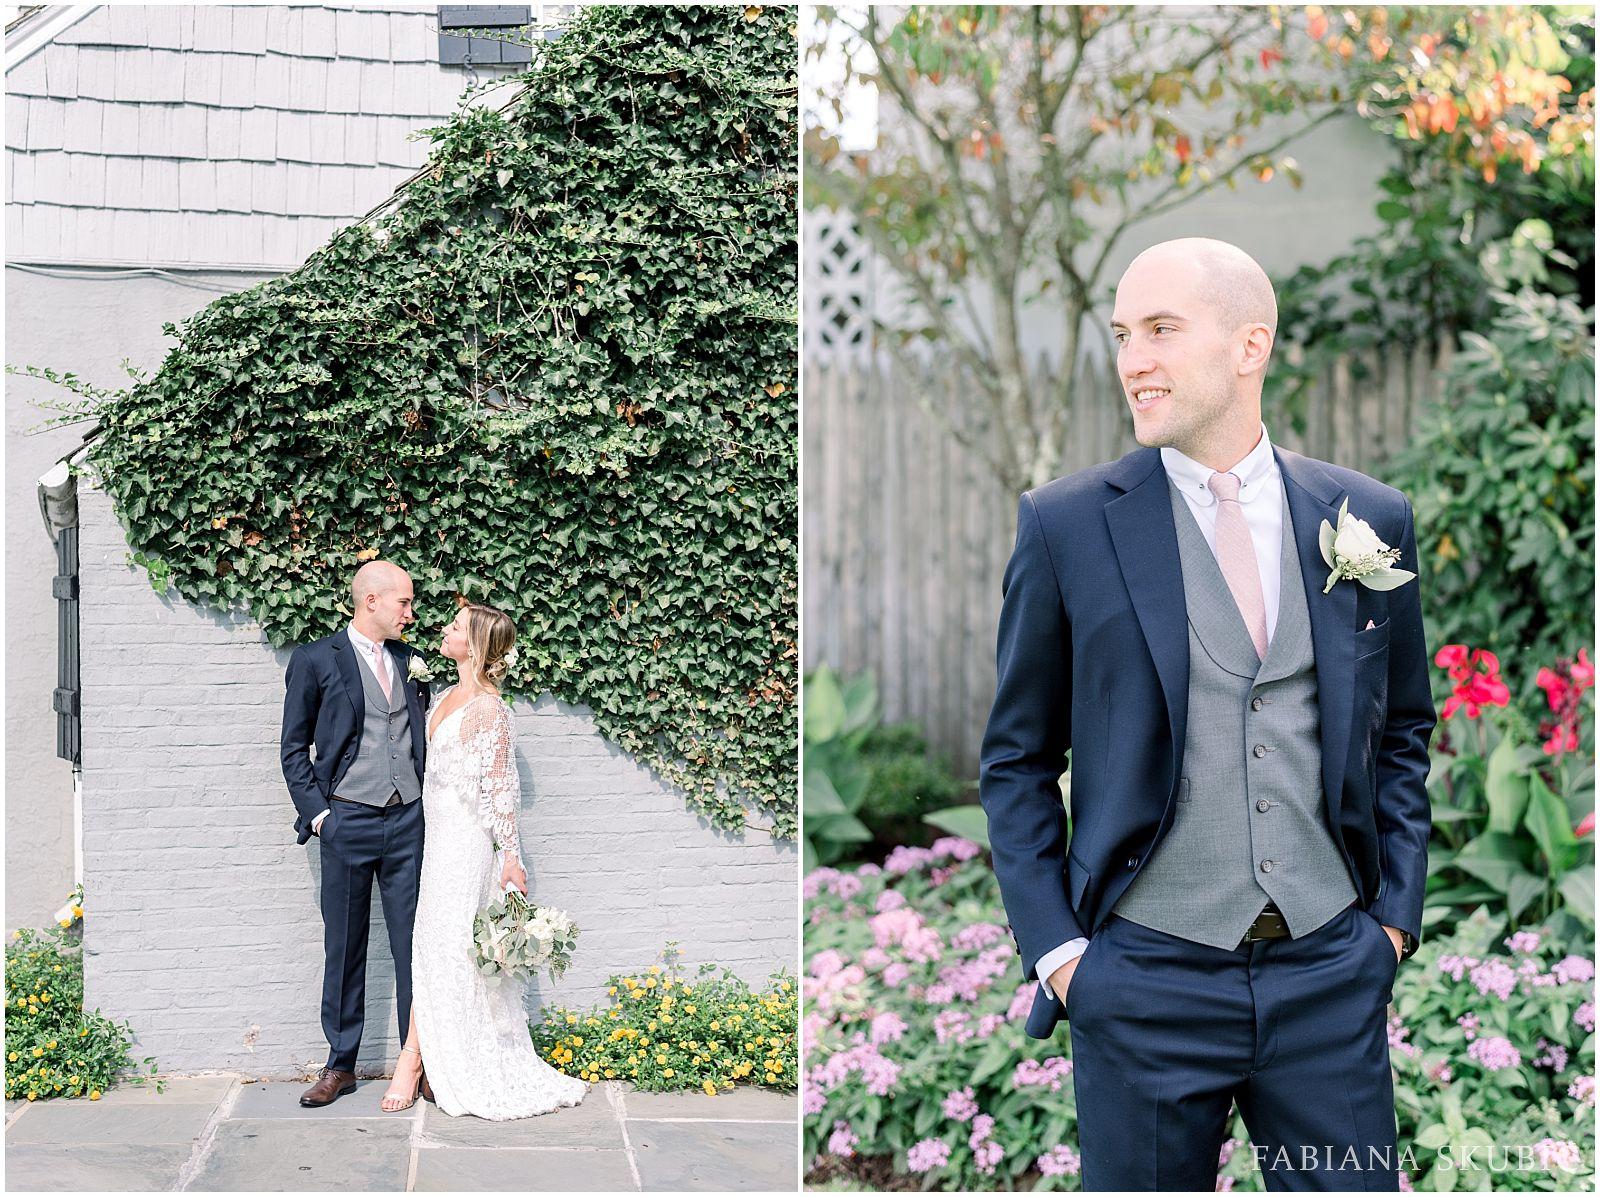 FabianaSkubic_H&M_Wedding_0033.jpg